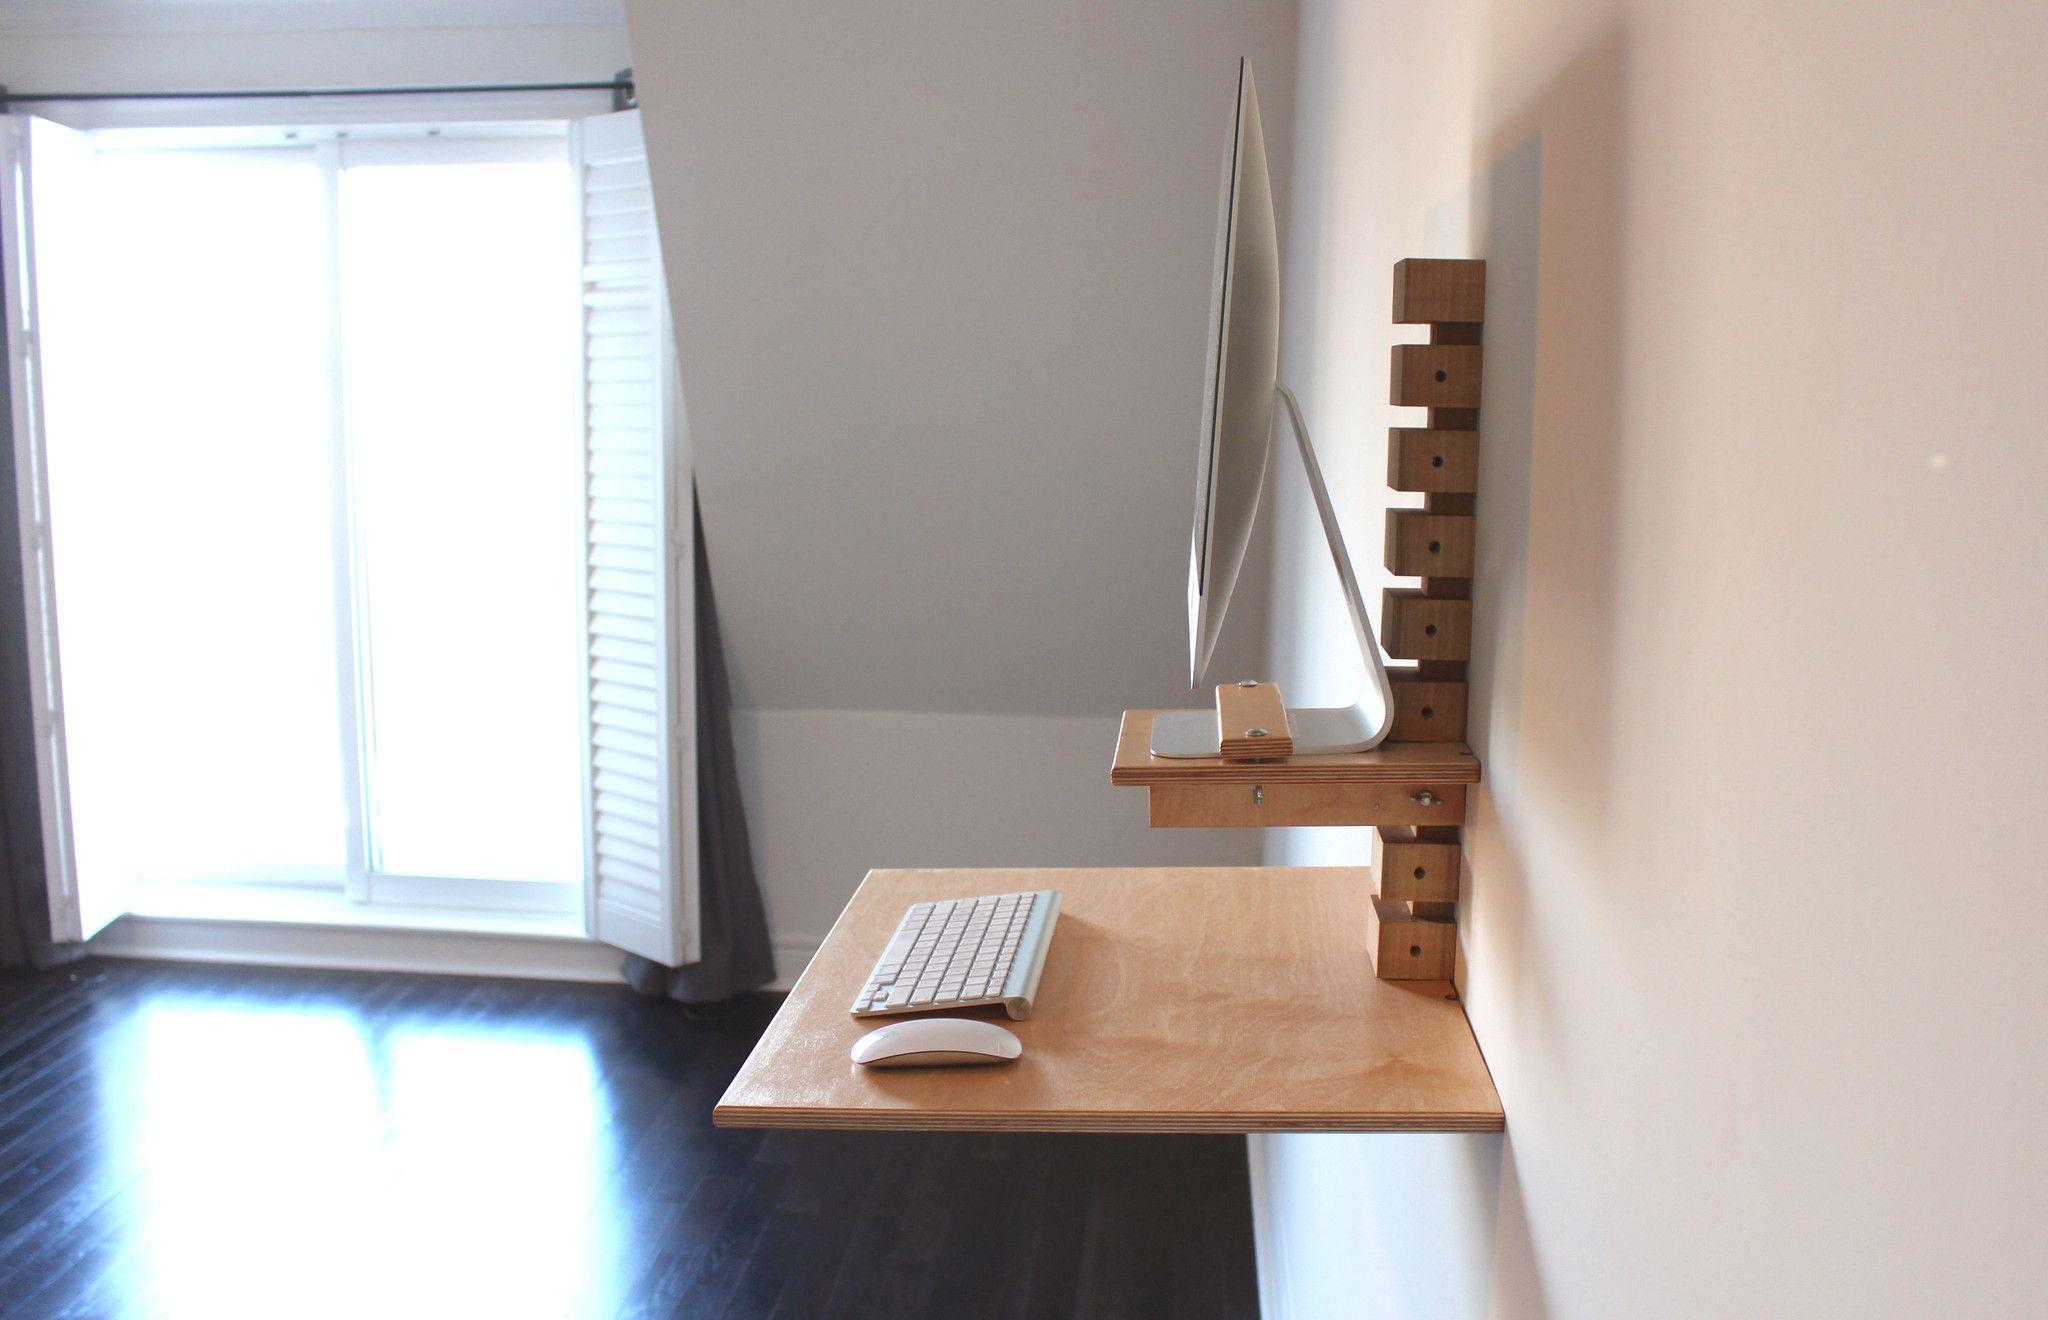 Wall Mounted Standing Desk Imac Model Standing Desk Design Standing Desk Accessories Standing Desk